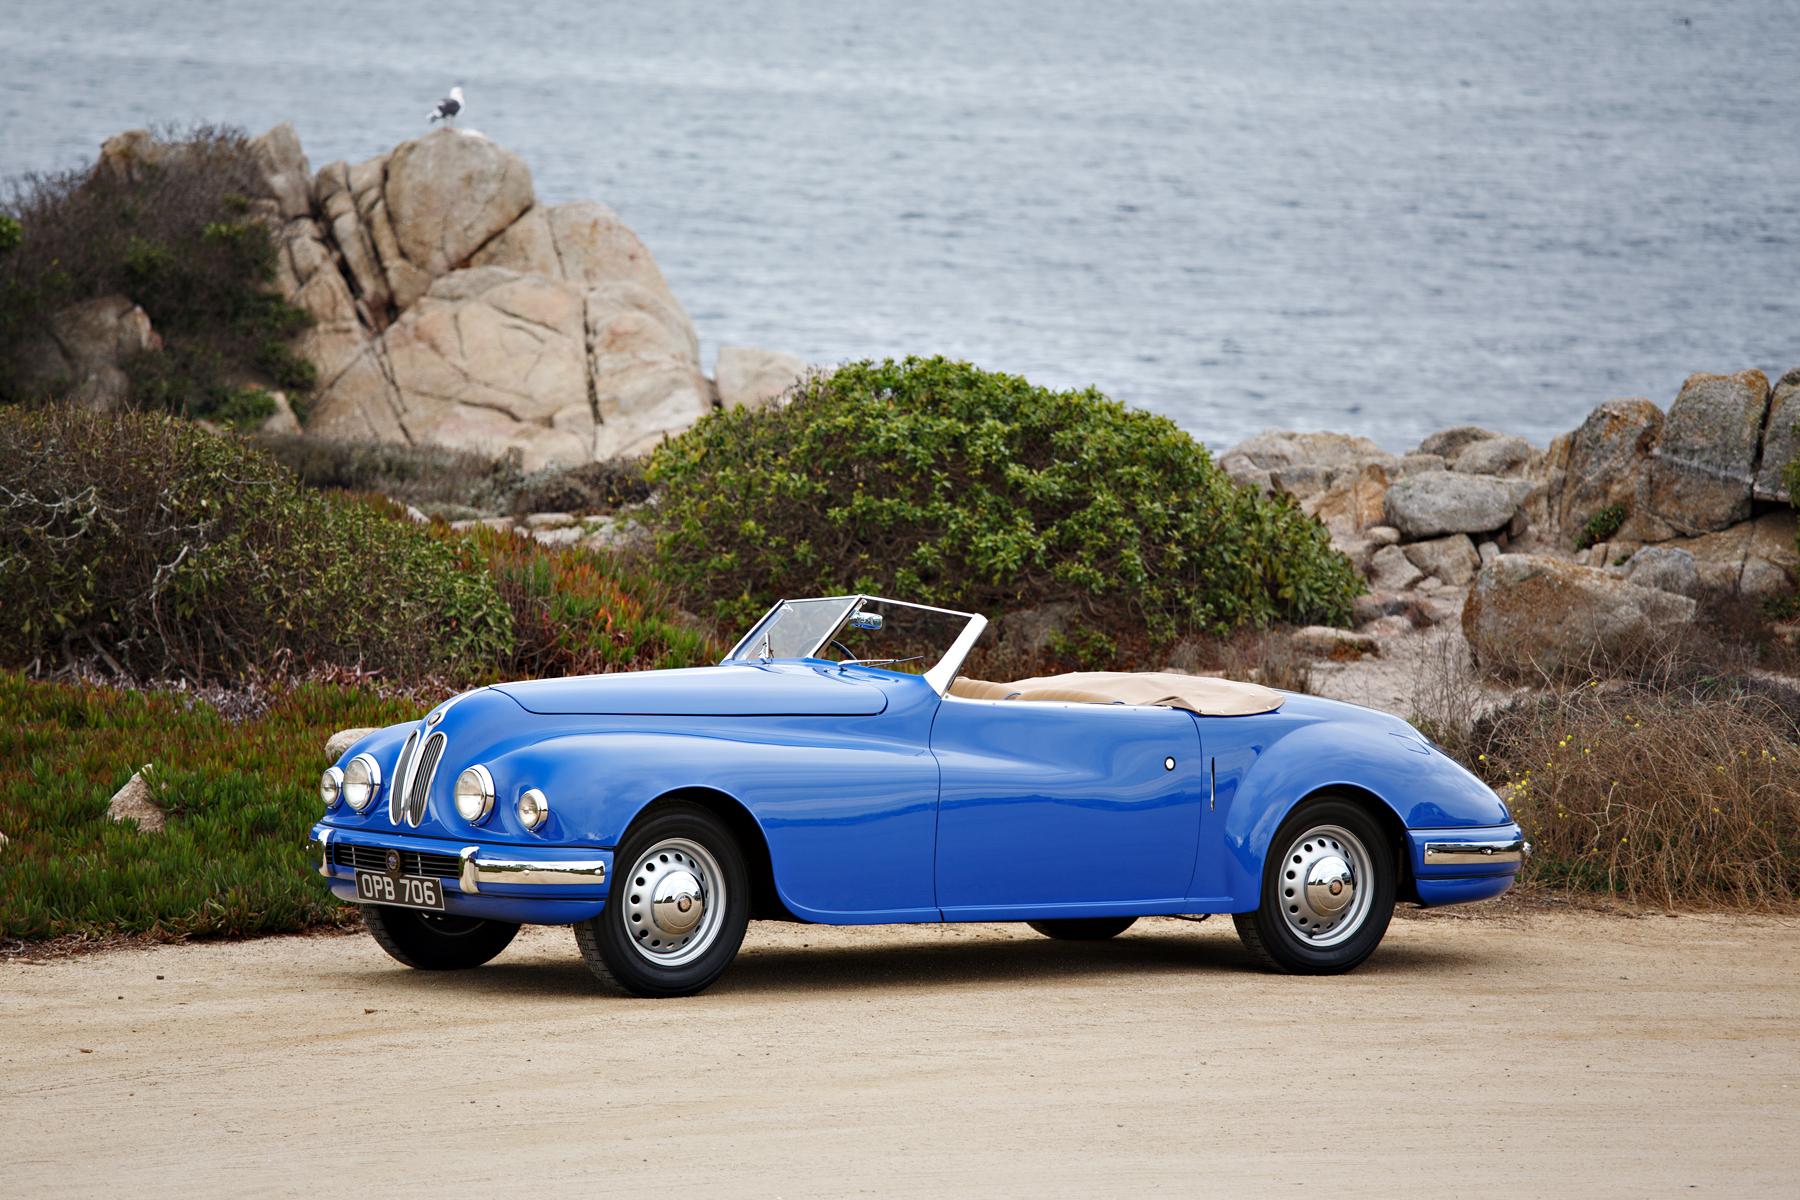 1949 Bristol 402 Cabriolet by the beach